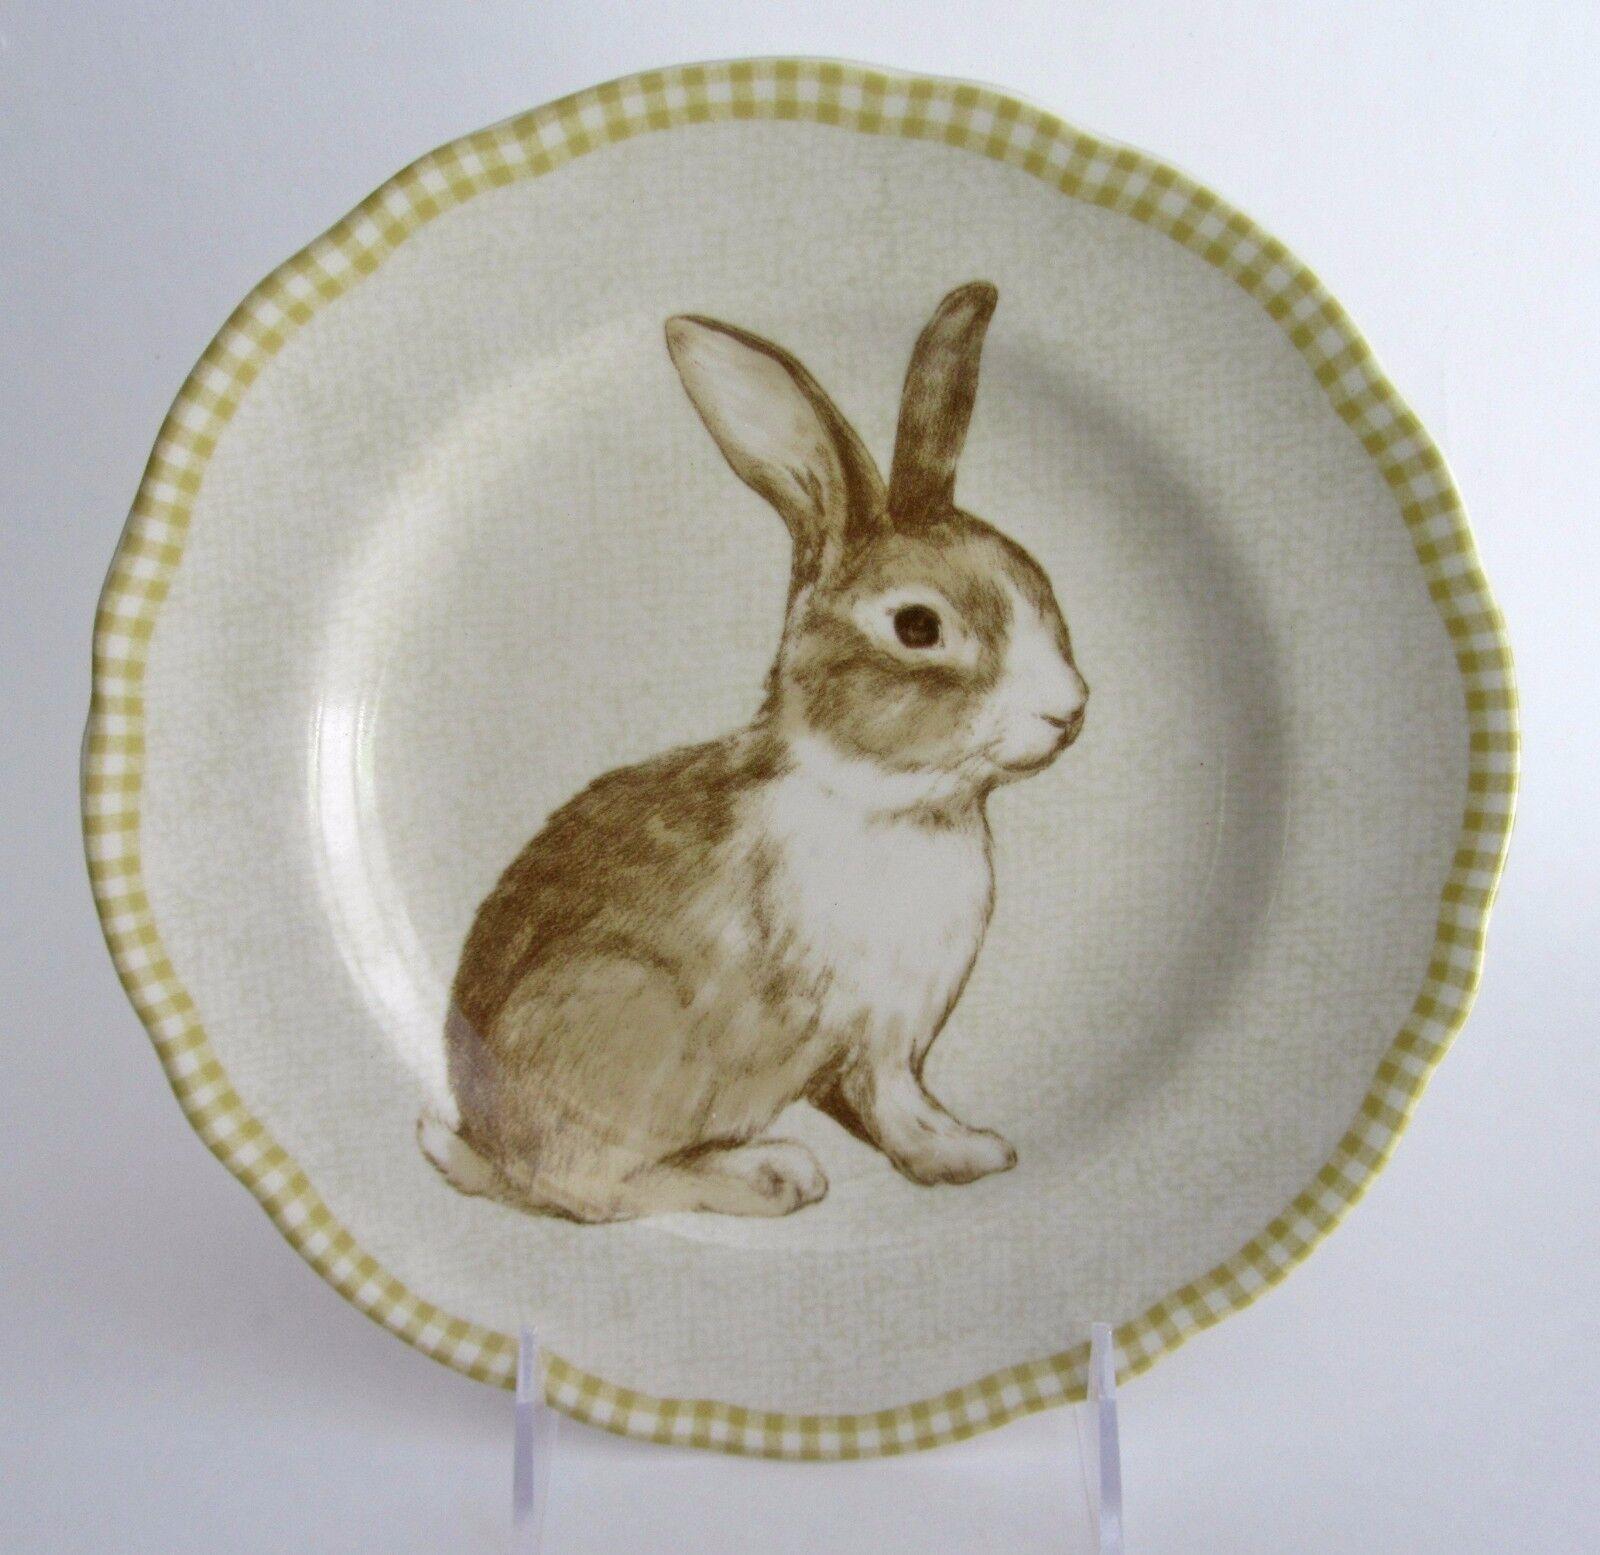 222 Fifth BUNNY LAND Salad Plates Rabbit Easter Gingham Borders SET-4 NEW